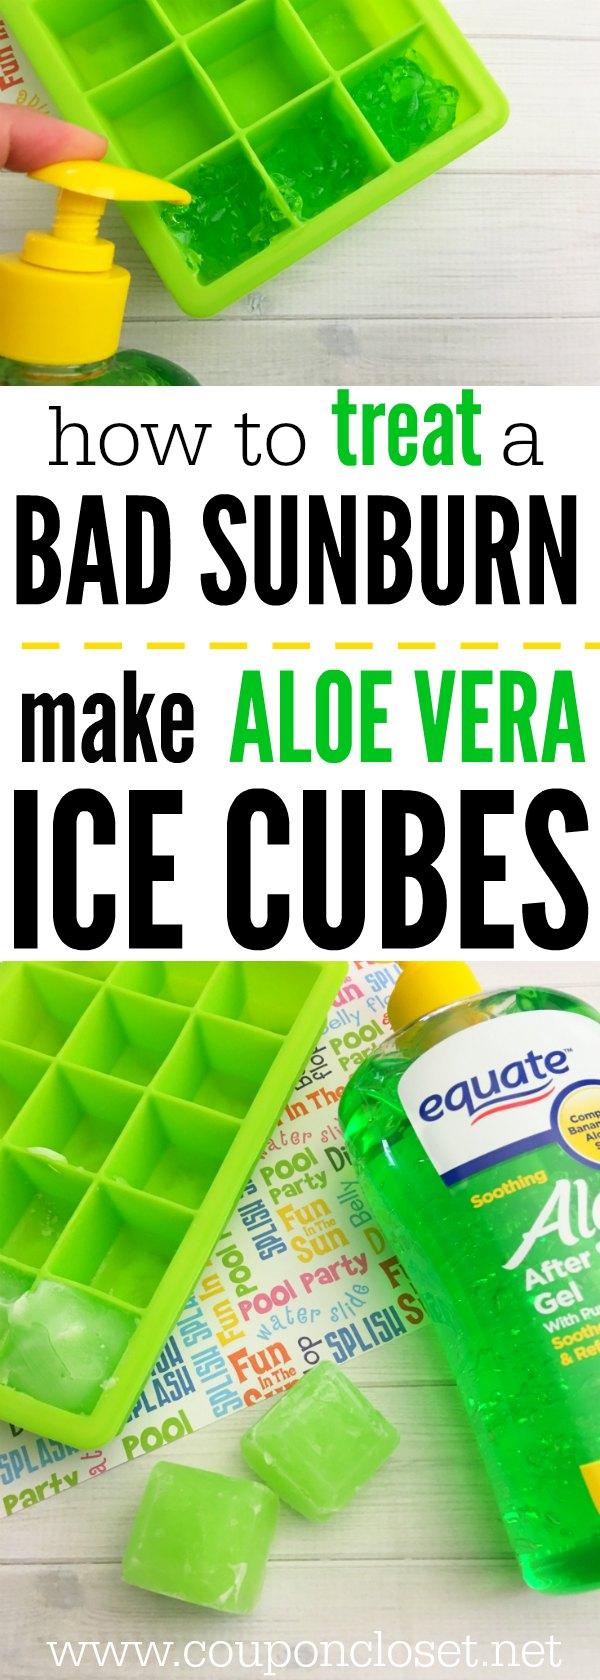 how to treat a bad sunburn with aloe vera ice cubes